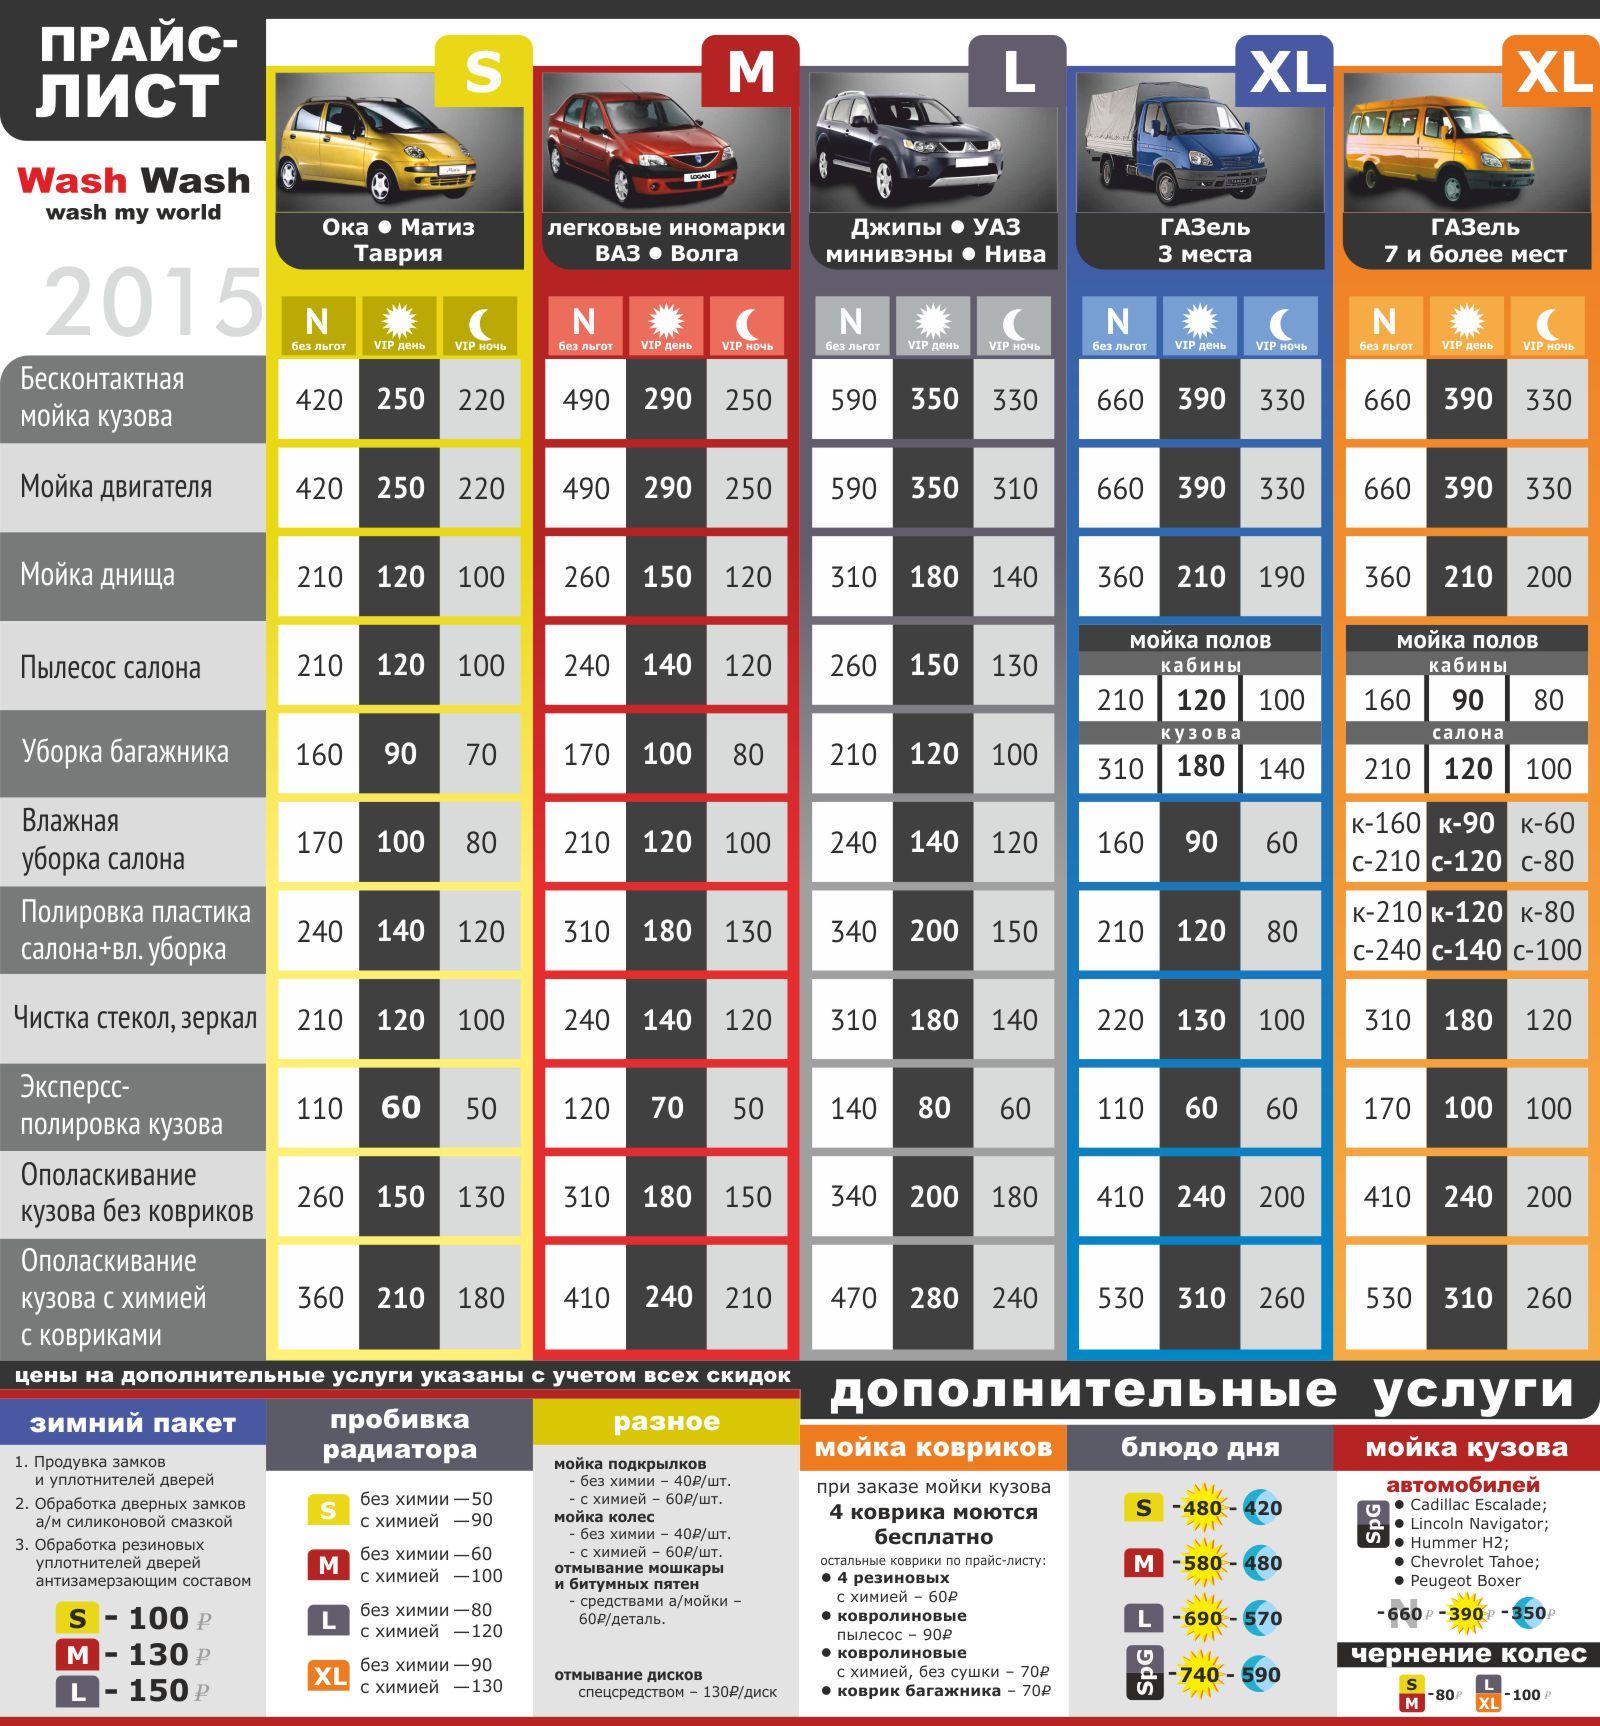 цены на мойку автомобиля